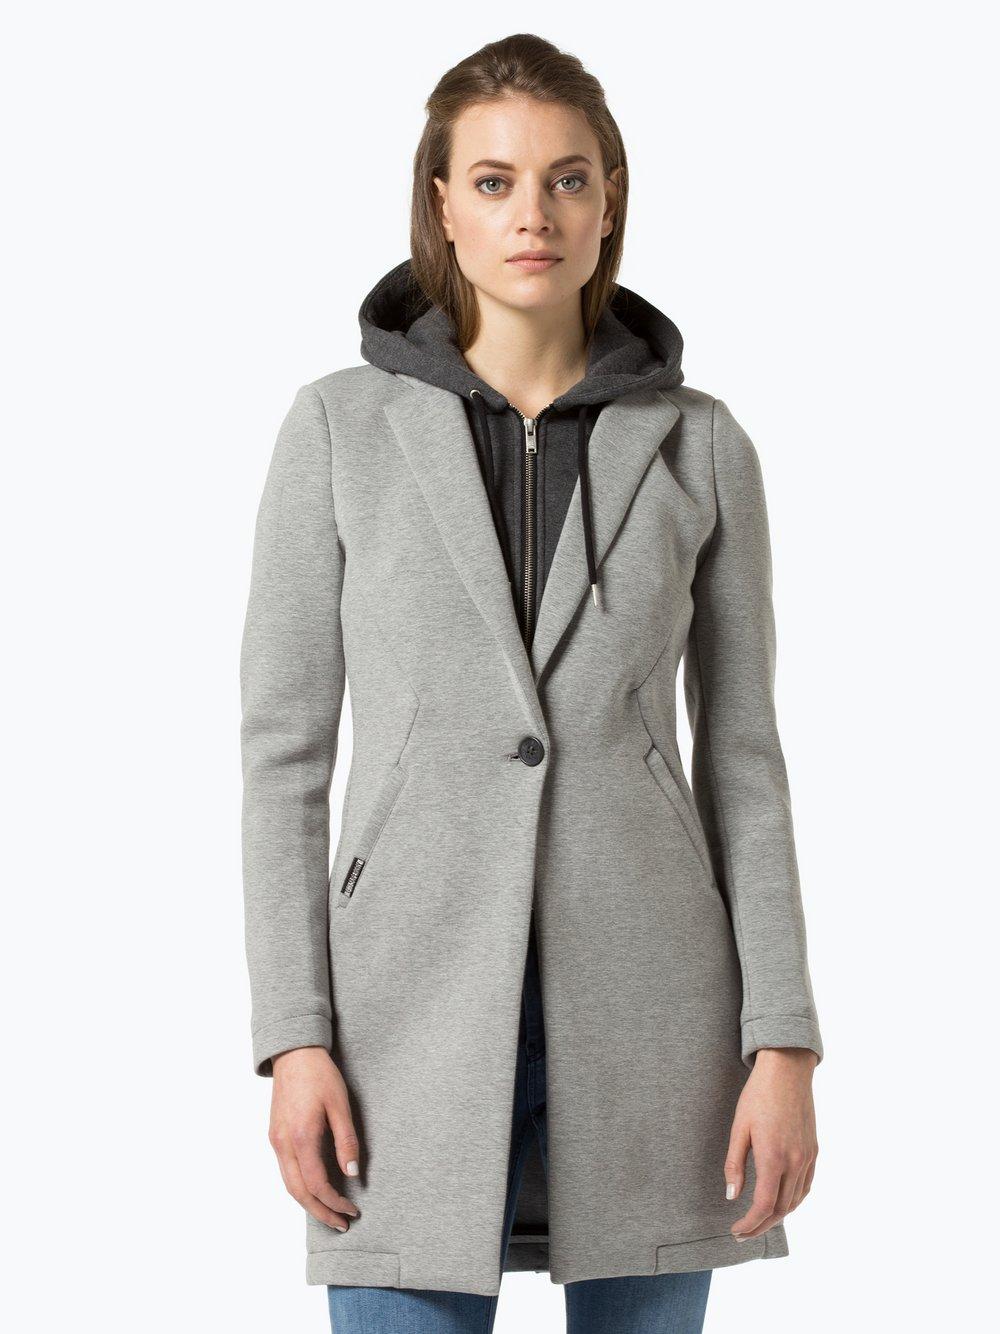 timeless design 56020 2064d Superdry Damen Mantel online kaufen | VANGRAAF.COM